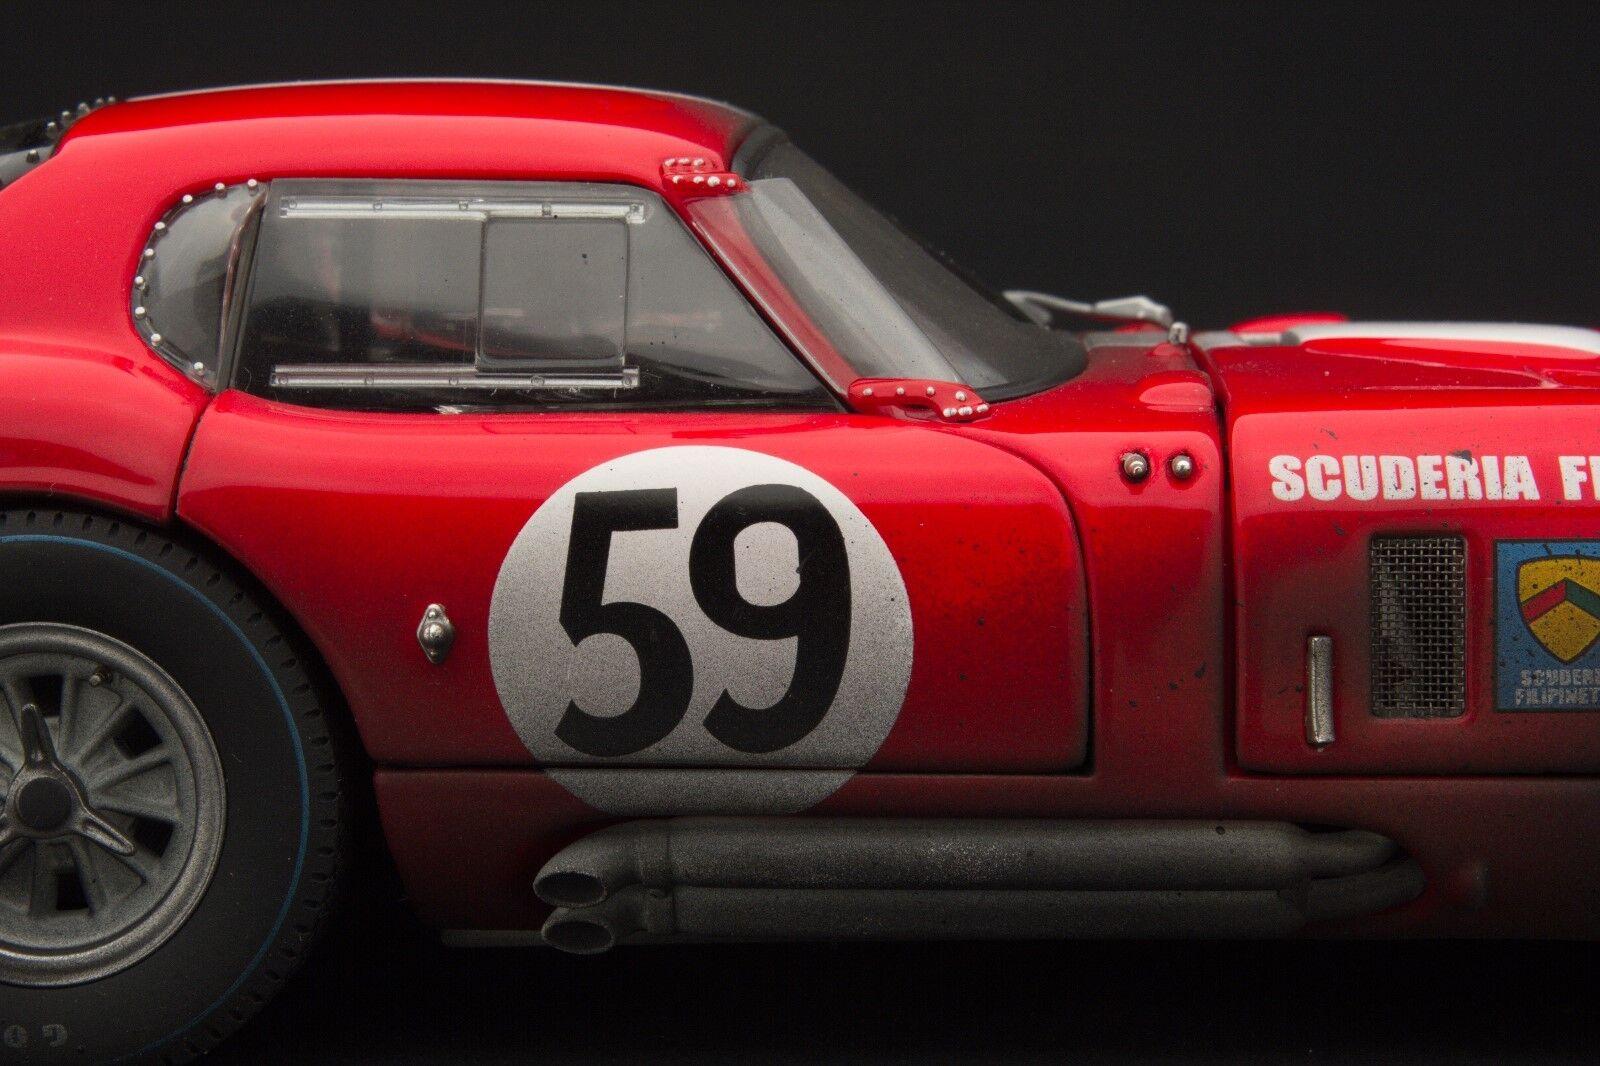 Course Patiné Exoto 1965 Filipinetti Cobra Daytona Lm 1 18  RLG18004BFLP